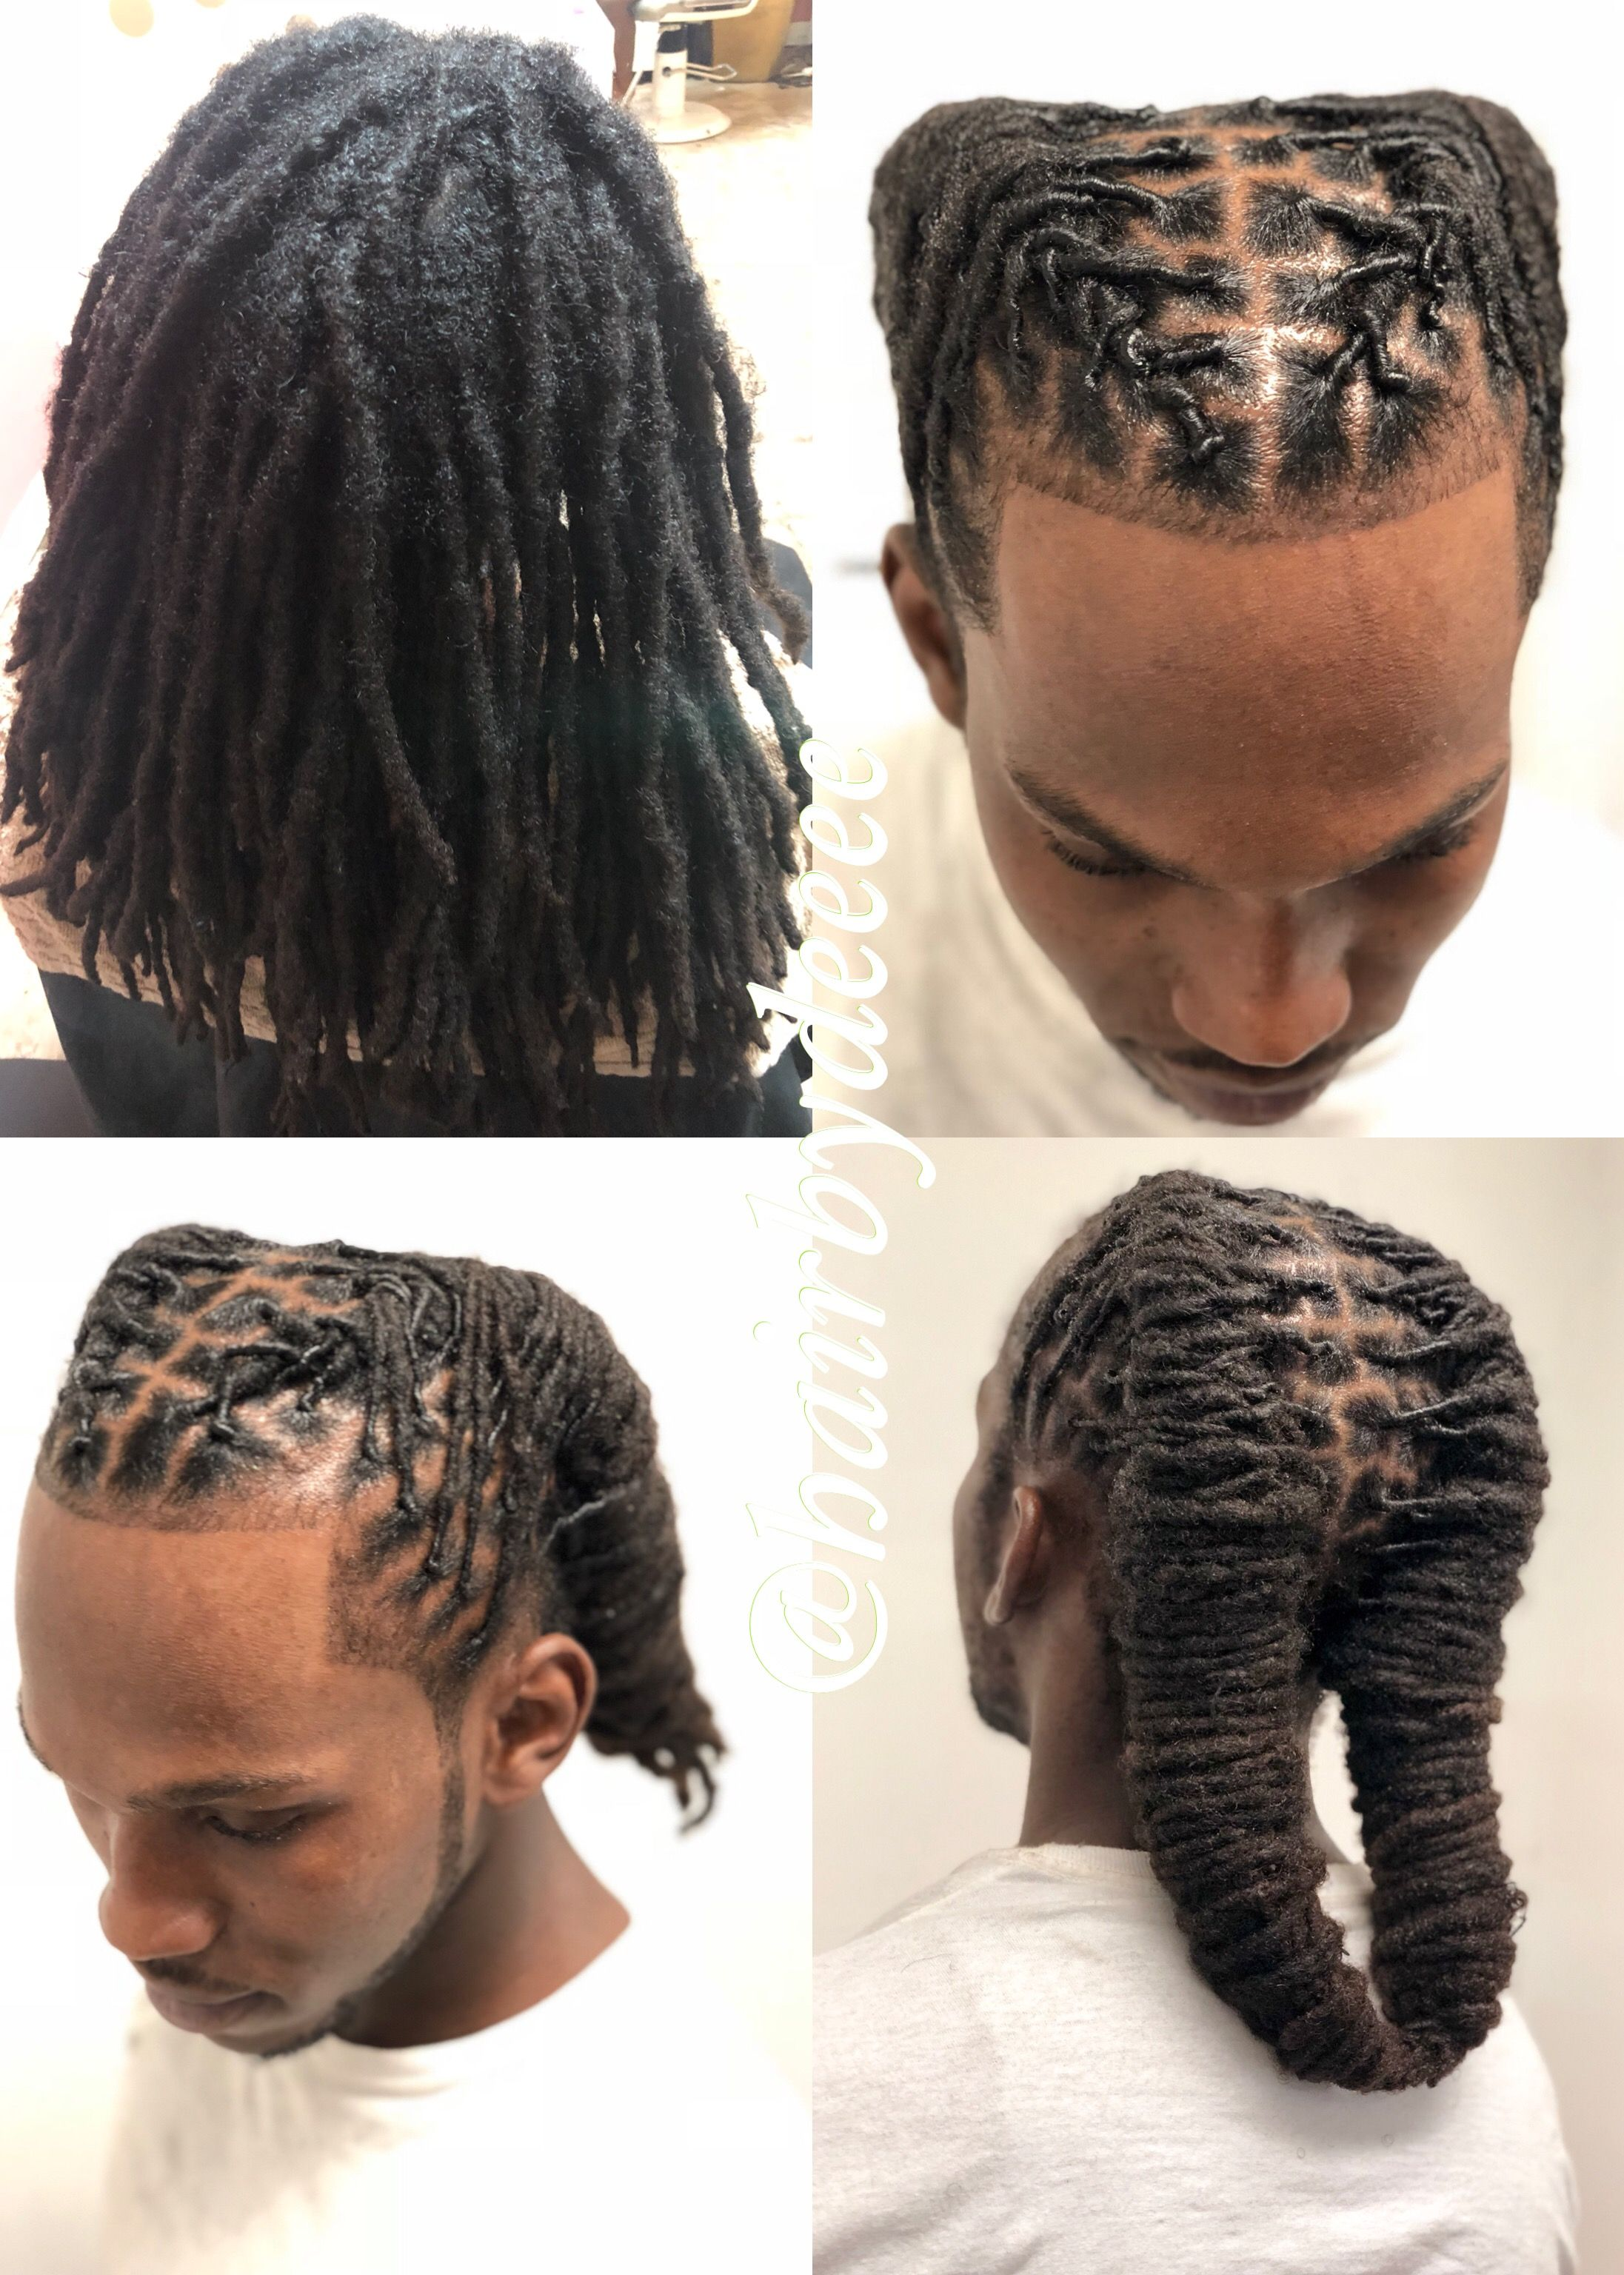 dreads styles for men   dreads style for men in 2019   dread